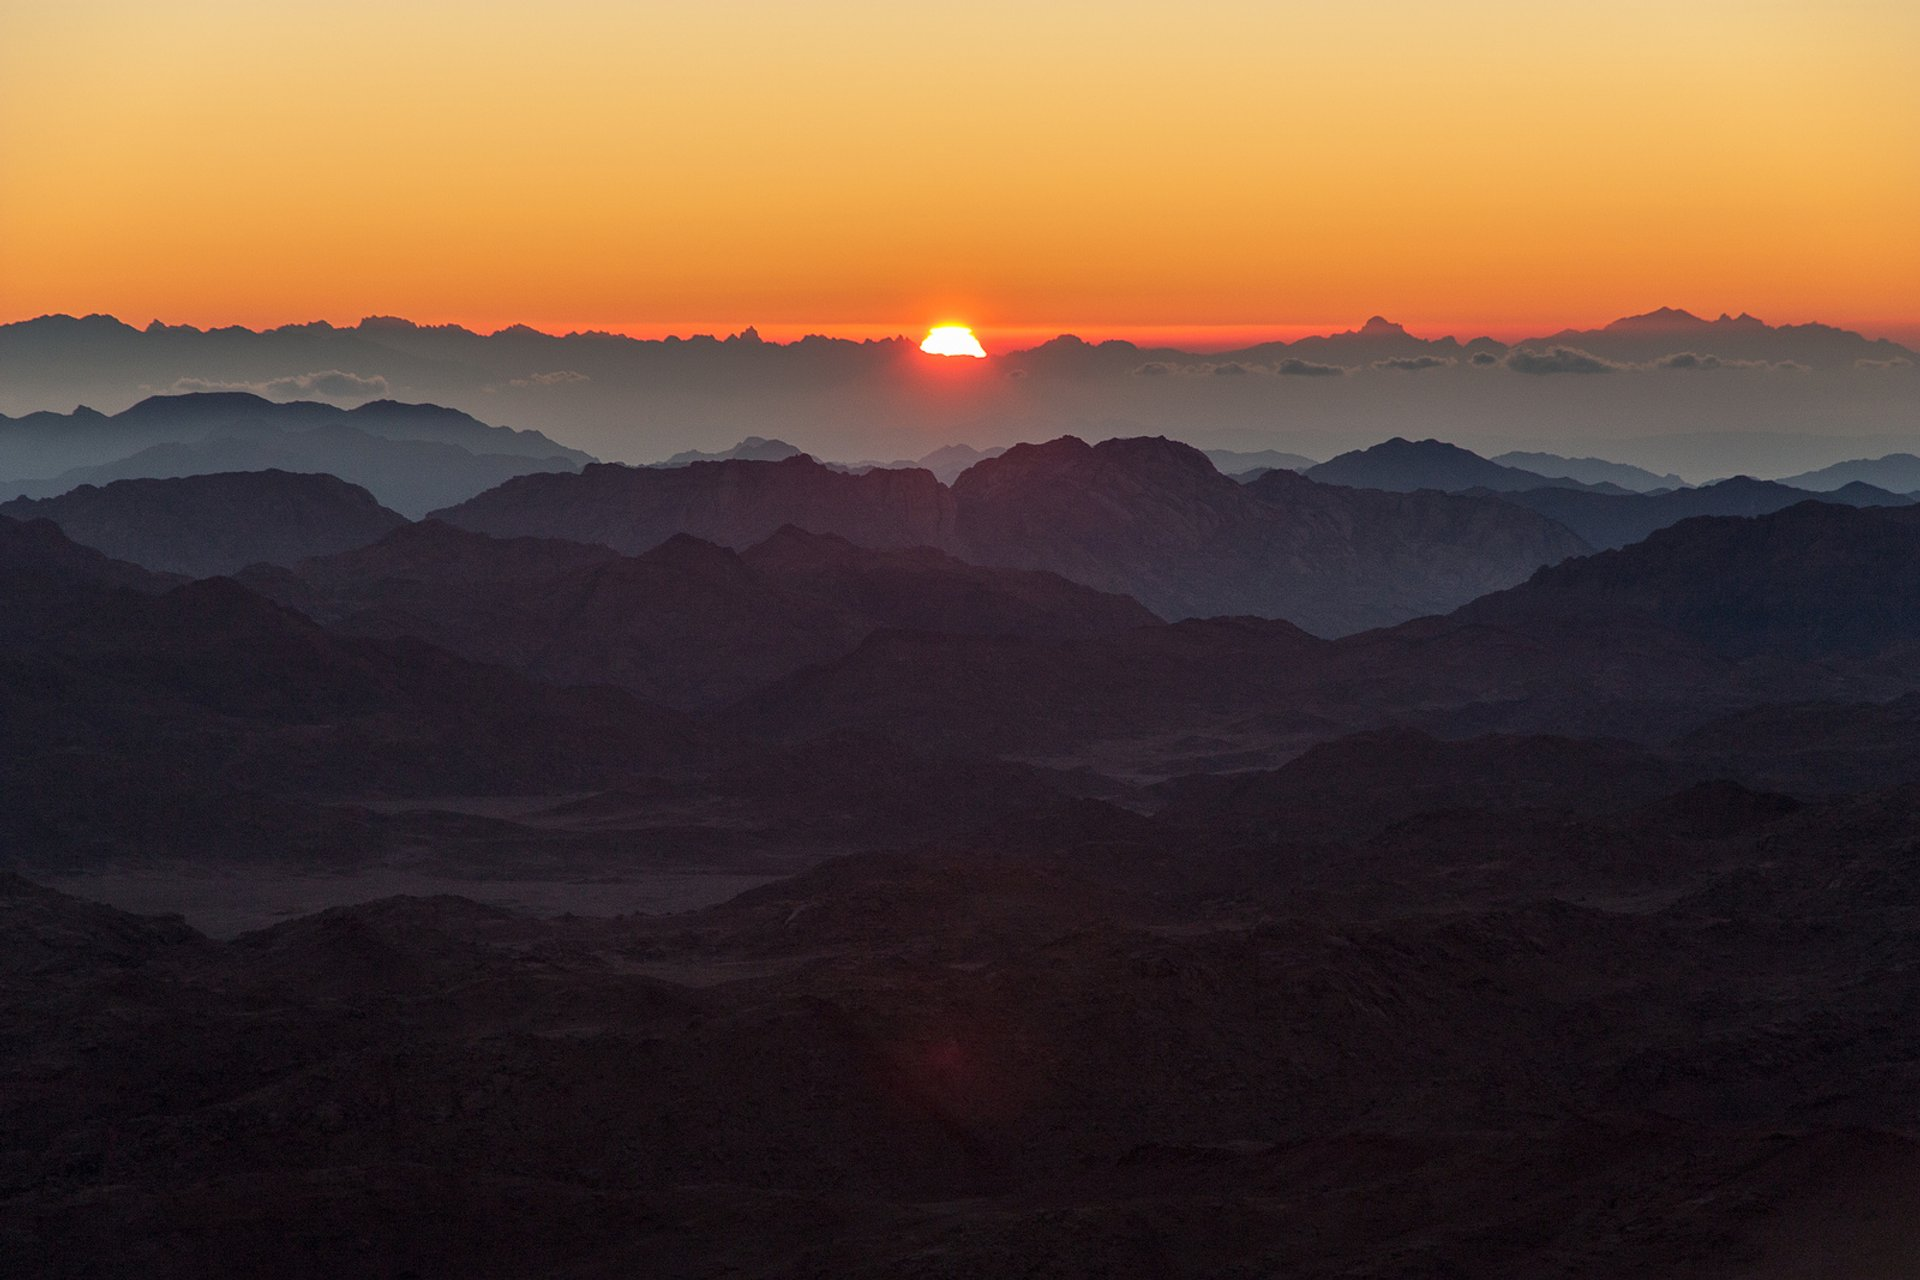 Sunrise or Sunset on Mount Sinai in Egypt 2019 - Best Time